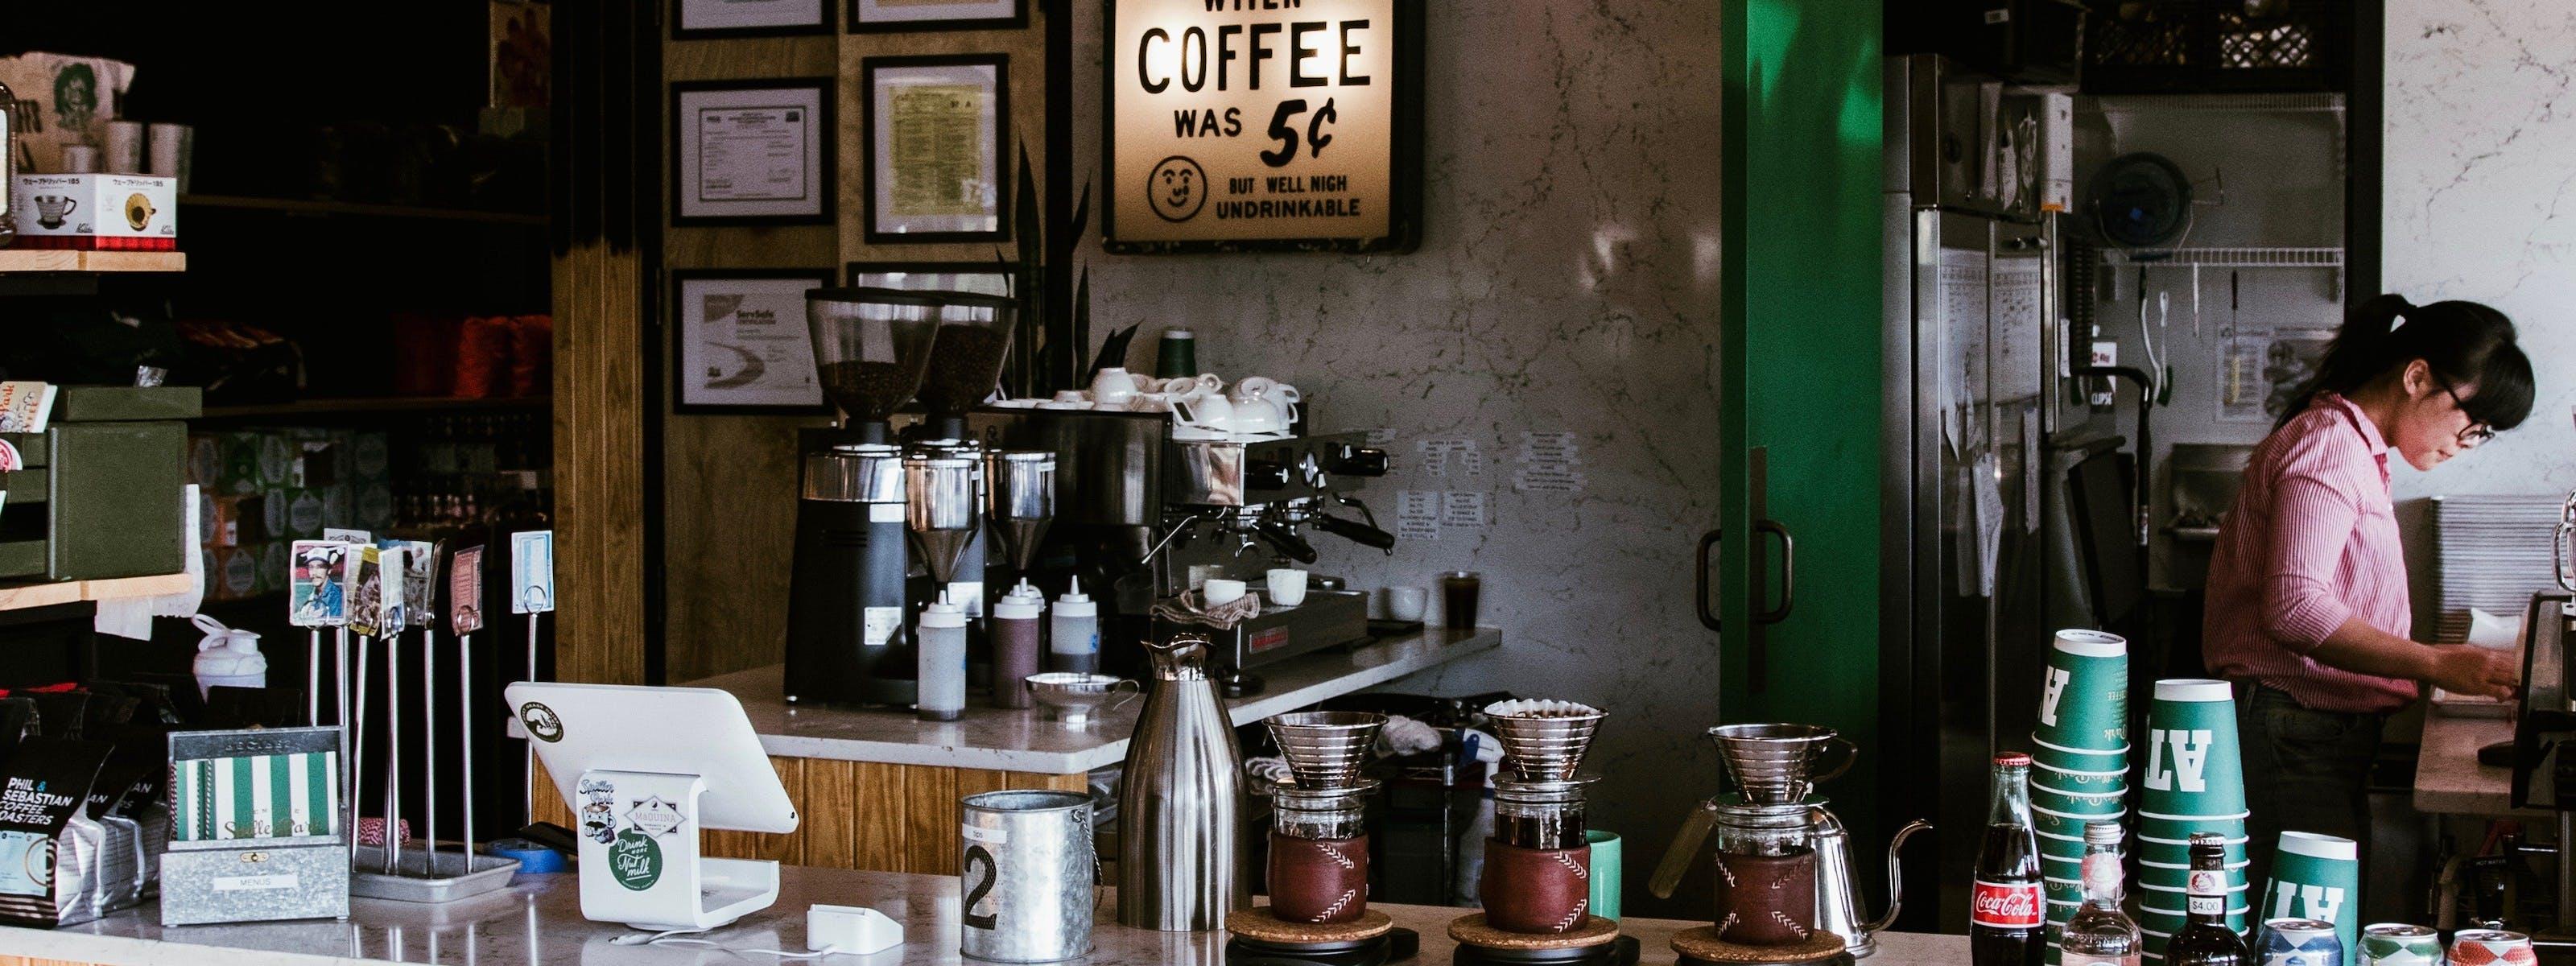 The 13 Best Coffee Shops In Atlanta - Atlanta - The Infatuation